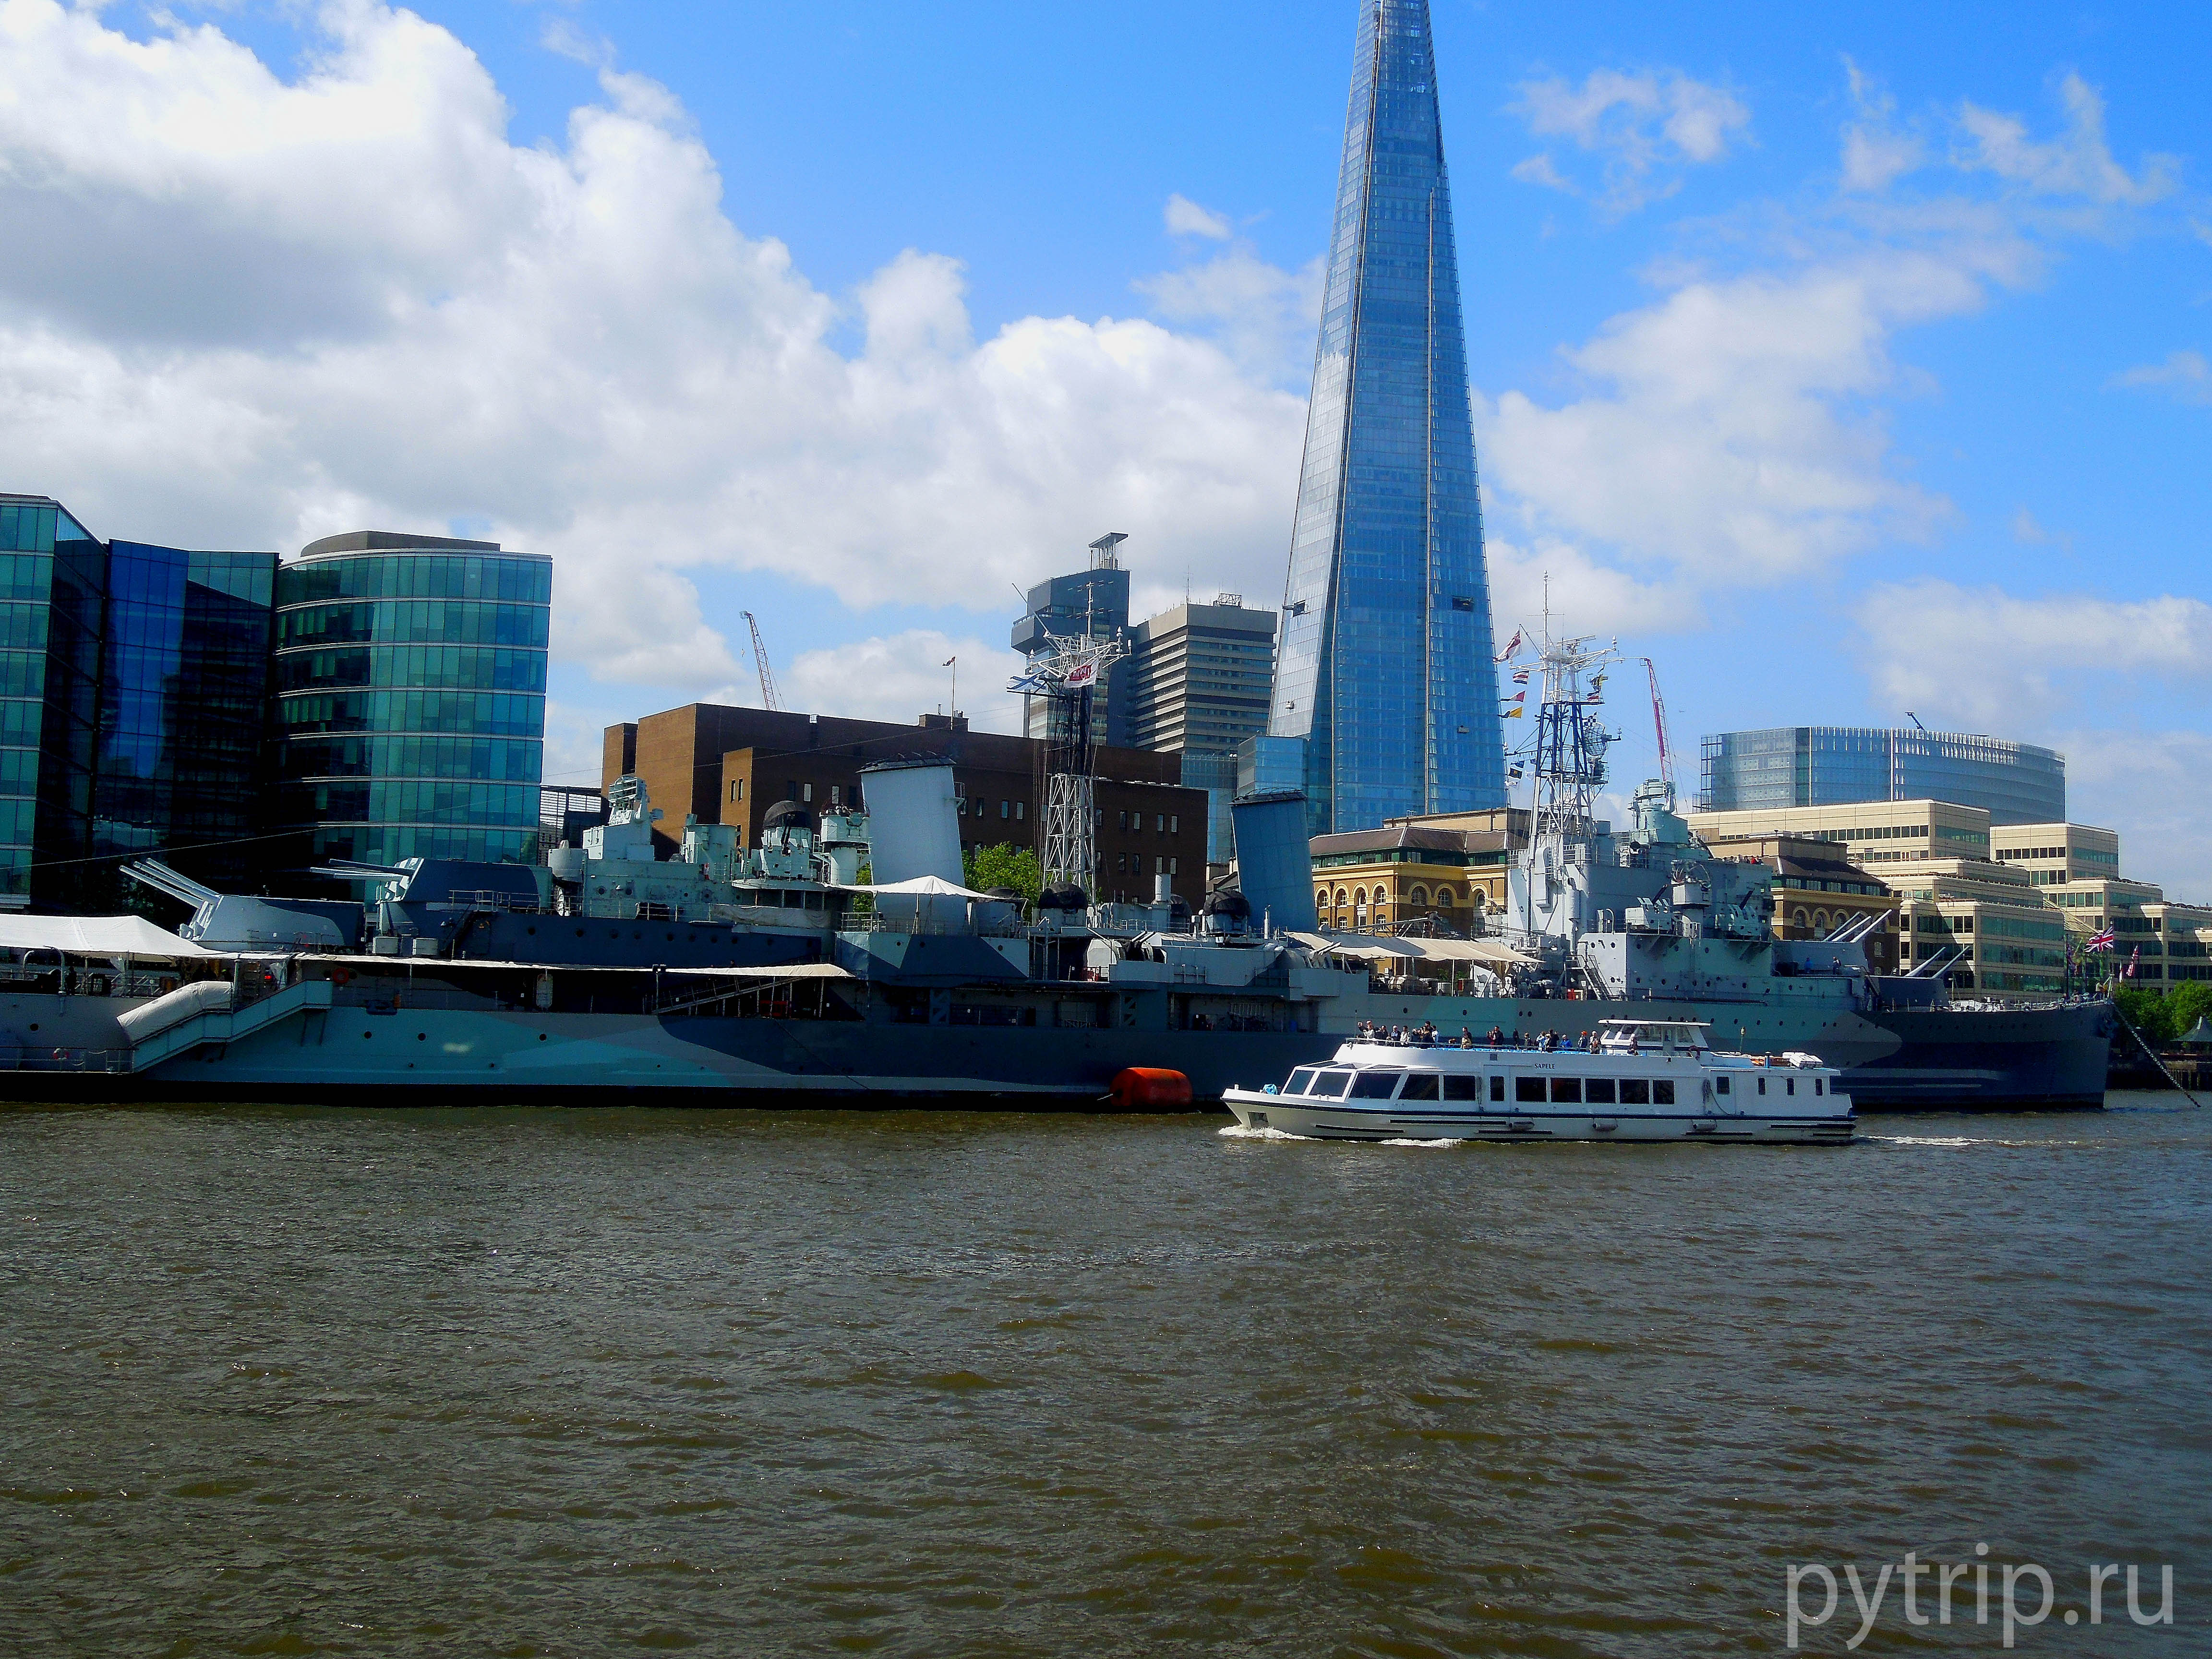 Небоскреб The Shard и крейсер Белфаст